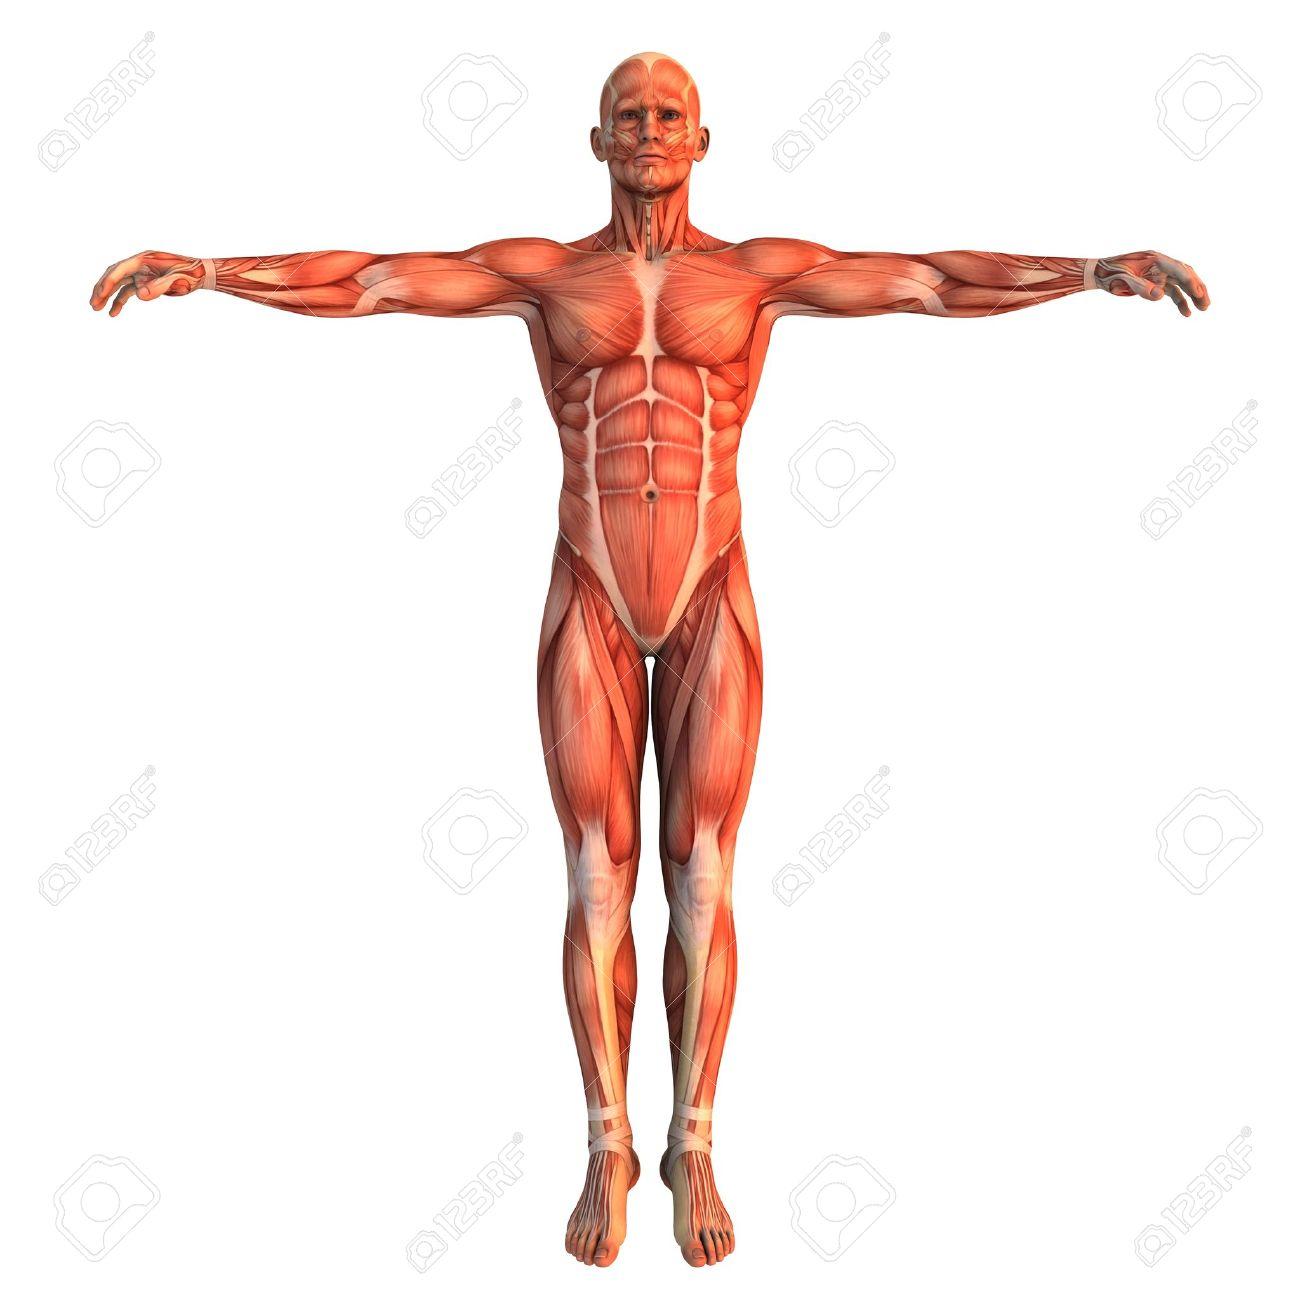 cuerpo humano - Mapa Mental - Amostra